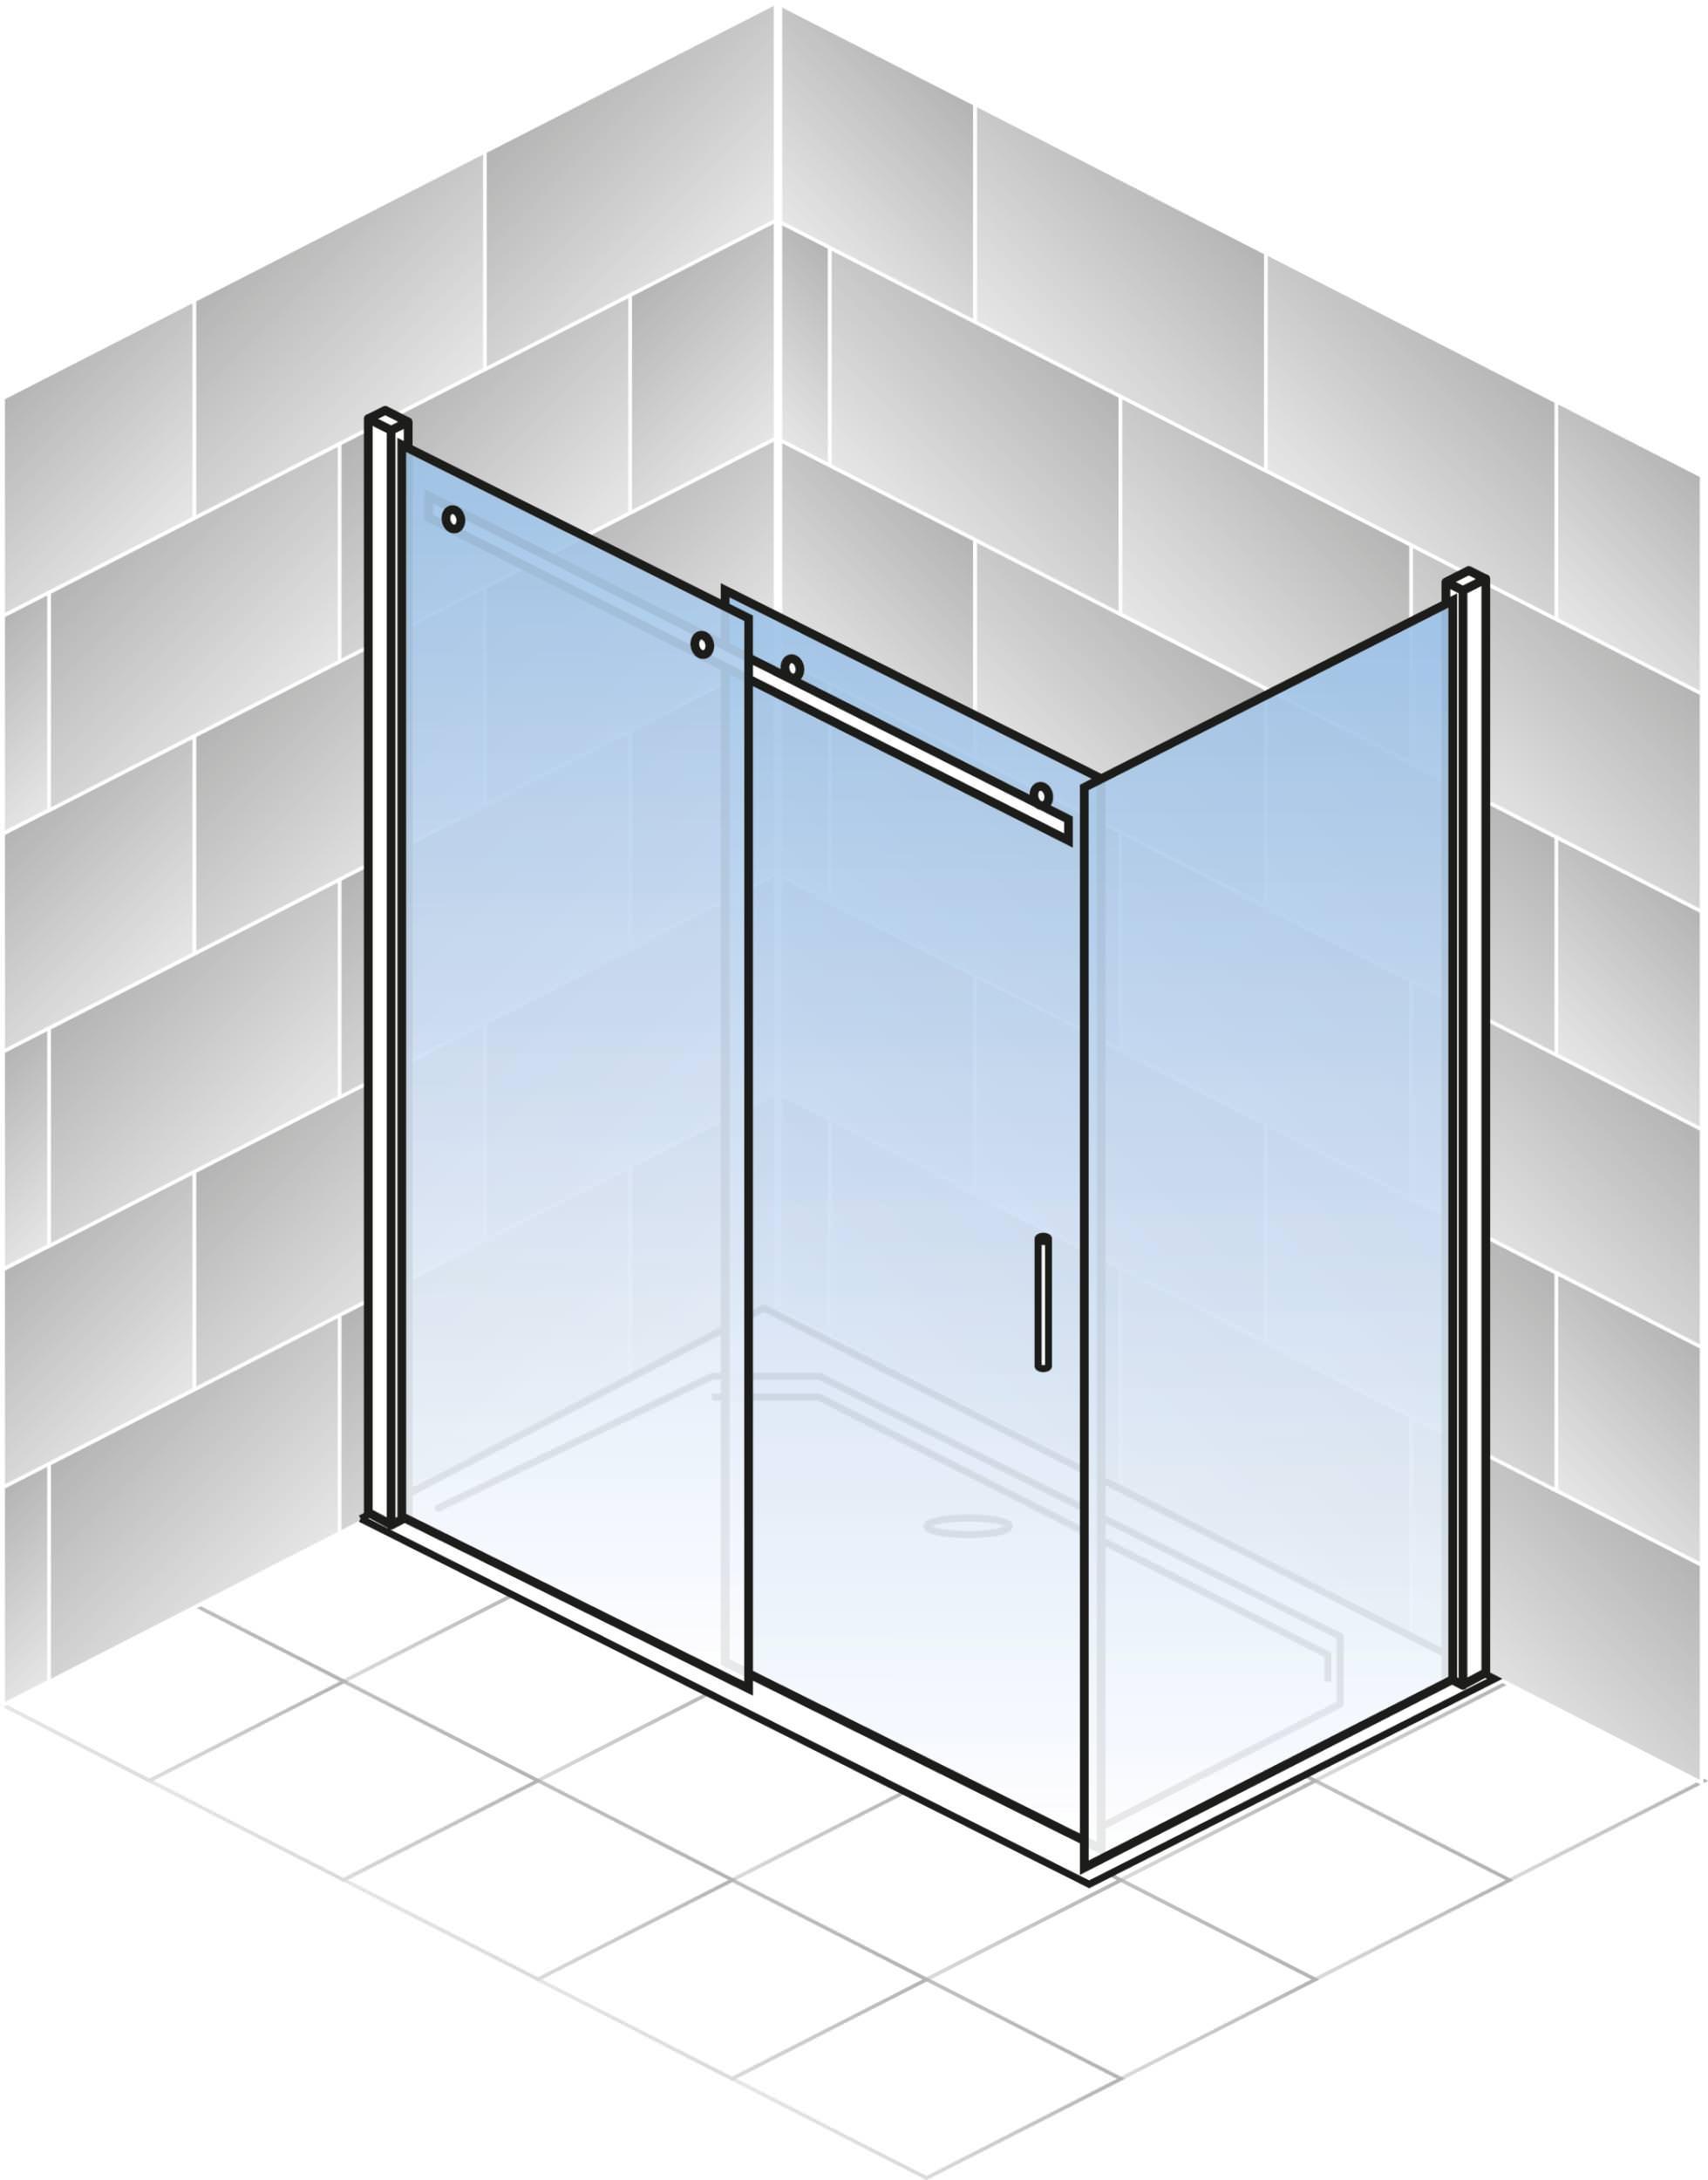 schulte alexa style 2 0 gleitt r mit seitenwand klarglas hell chromoptik 120 x 80 cm 200 cm sw. Black Bedroom Furniture Sets. Home Design Ideas